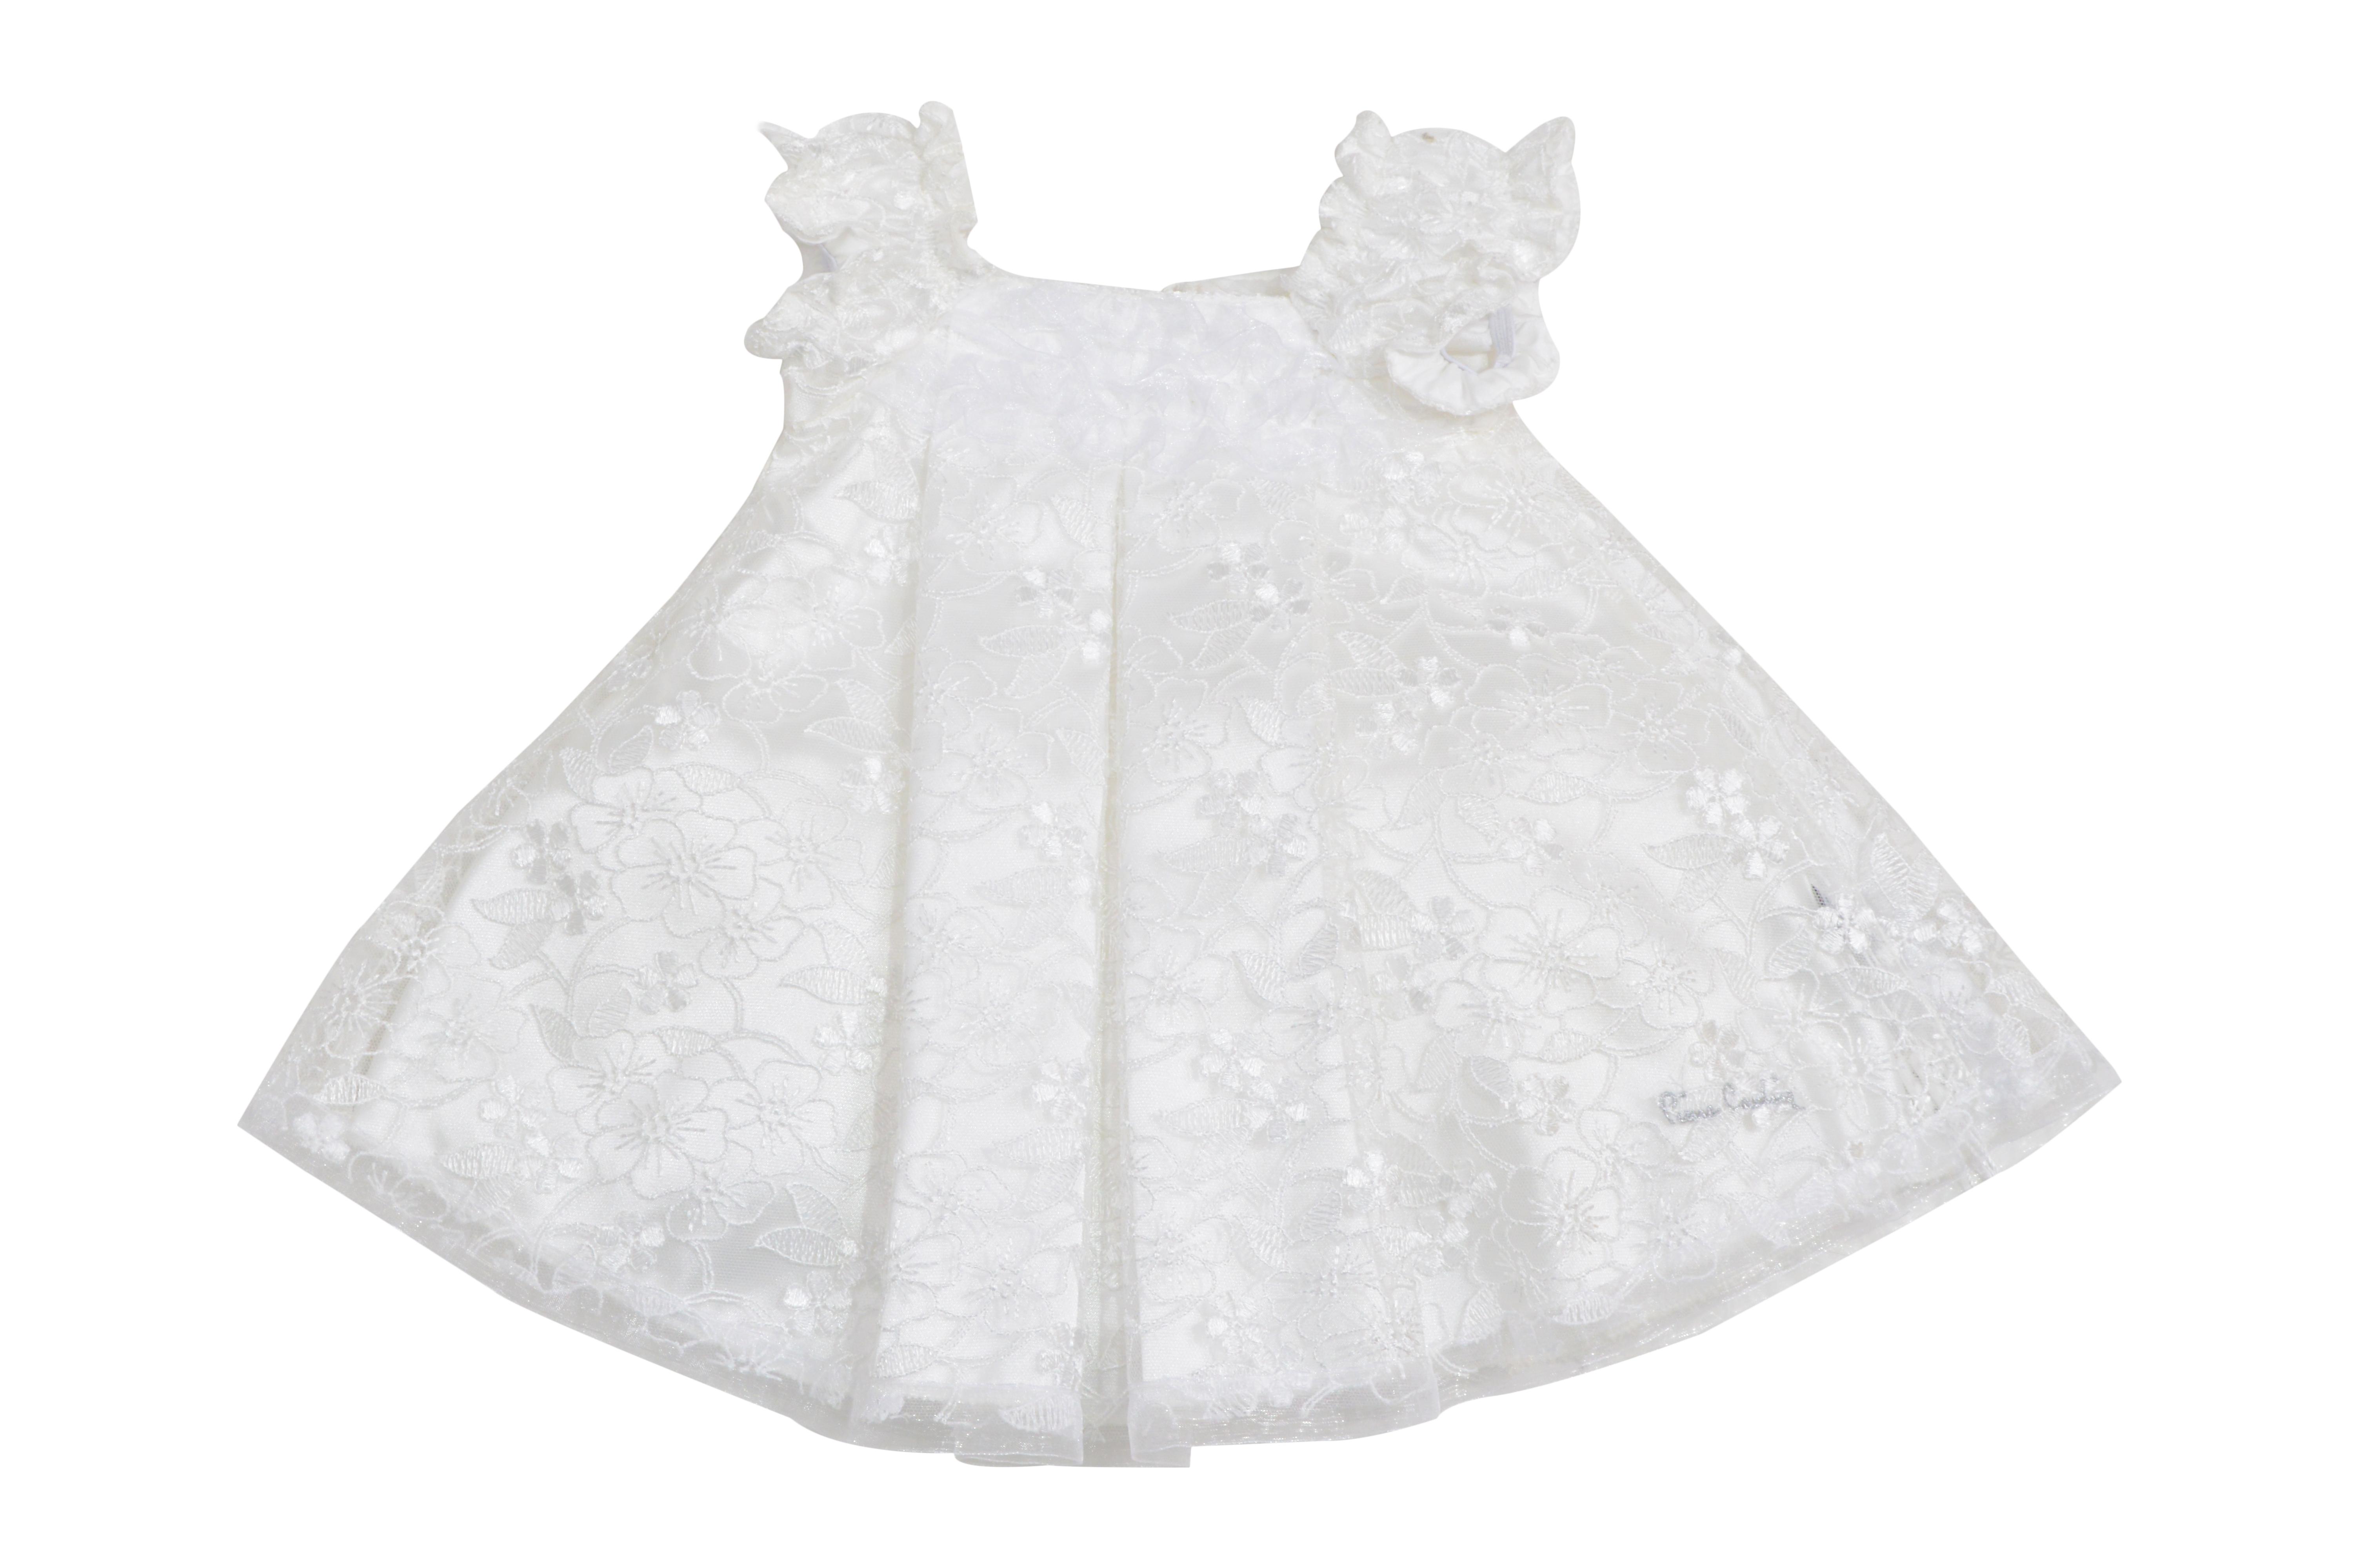 301128 Pierrecardin Mevlut Elbise